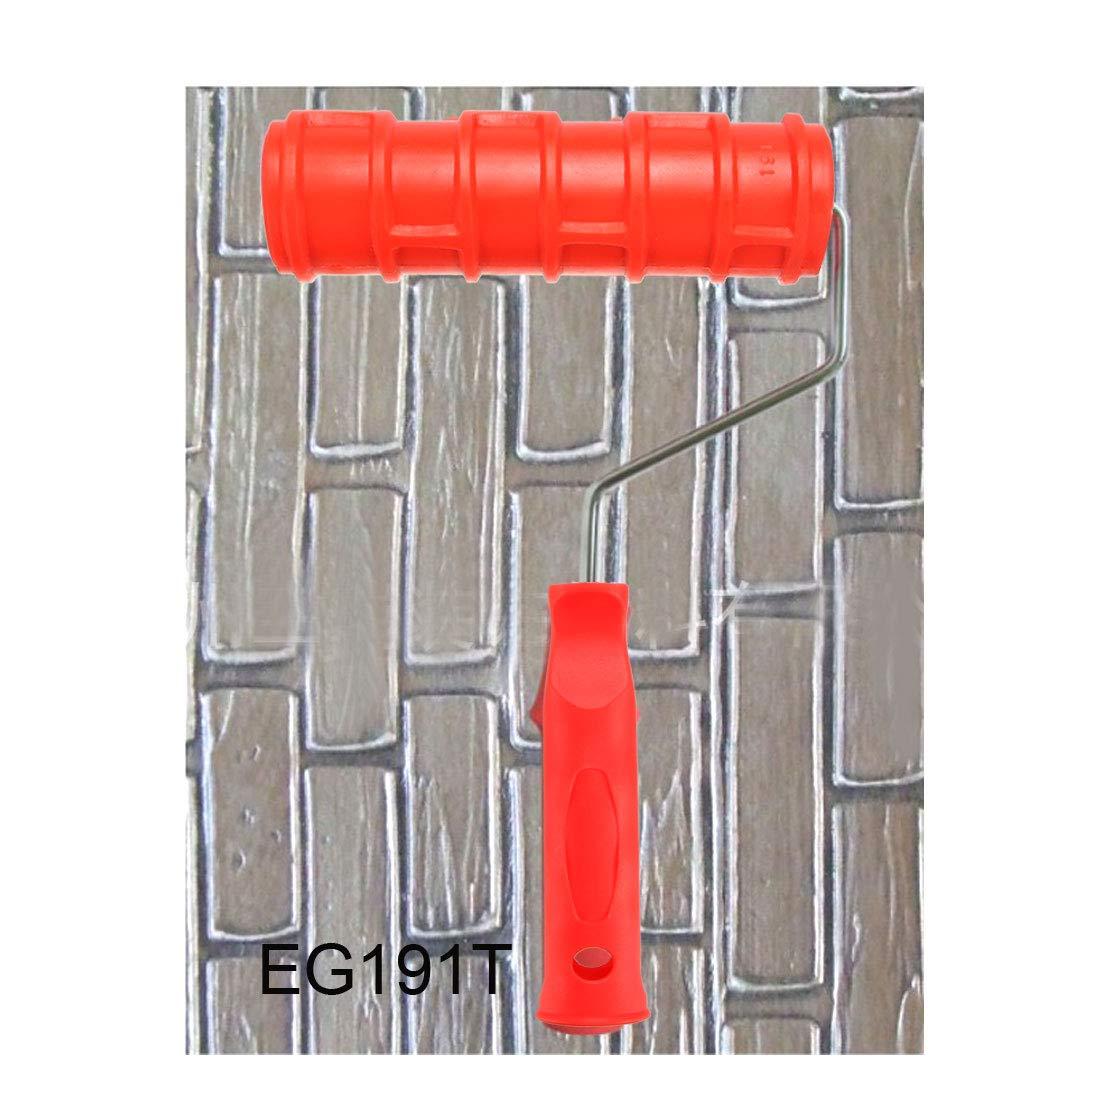 uxcell Painting Roller Decoration Empaistic Wooden Grain Paint Roller w Plastic Handle EG191T